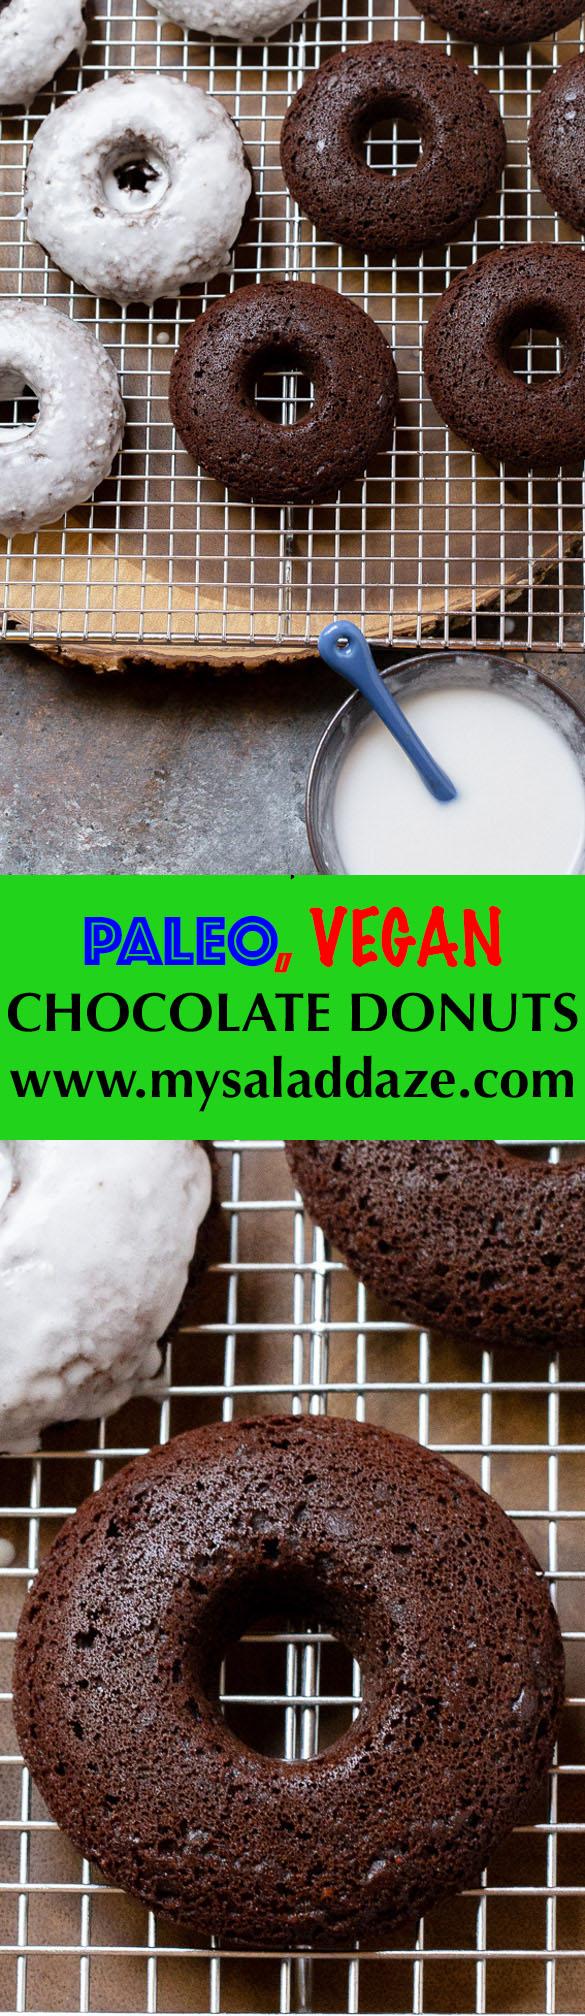 paleo vegan chocolate cake donuts